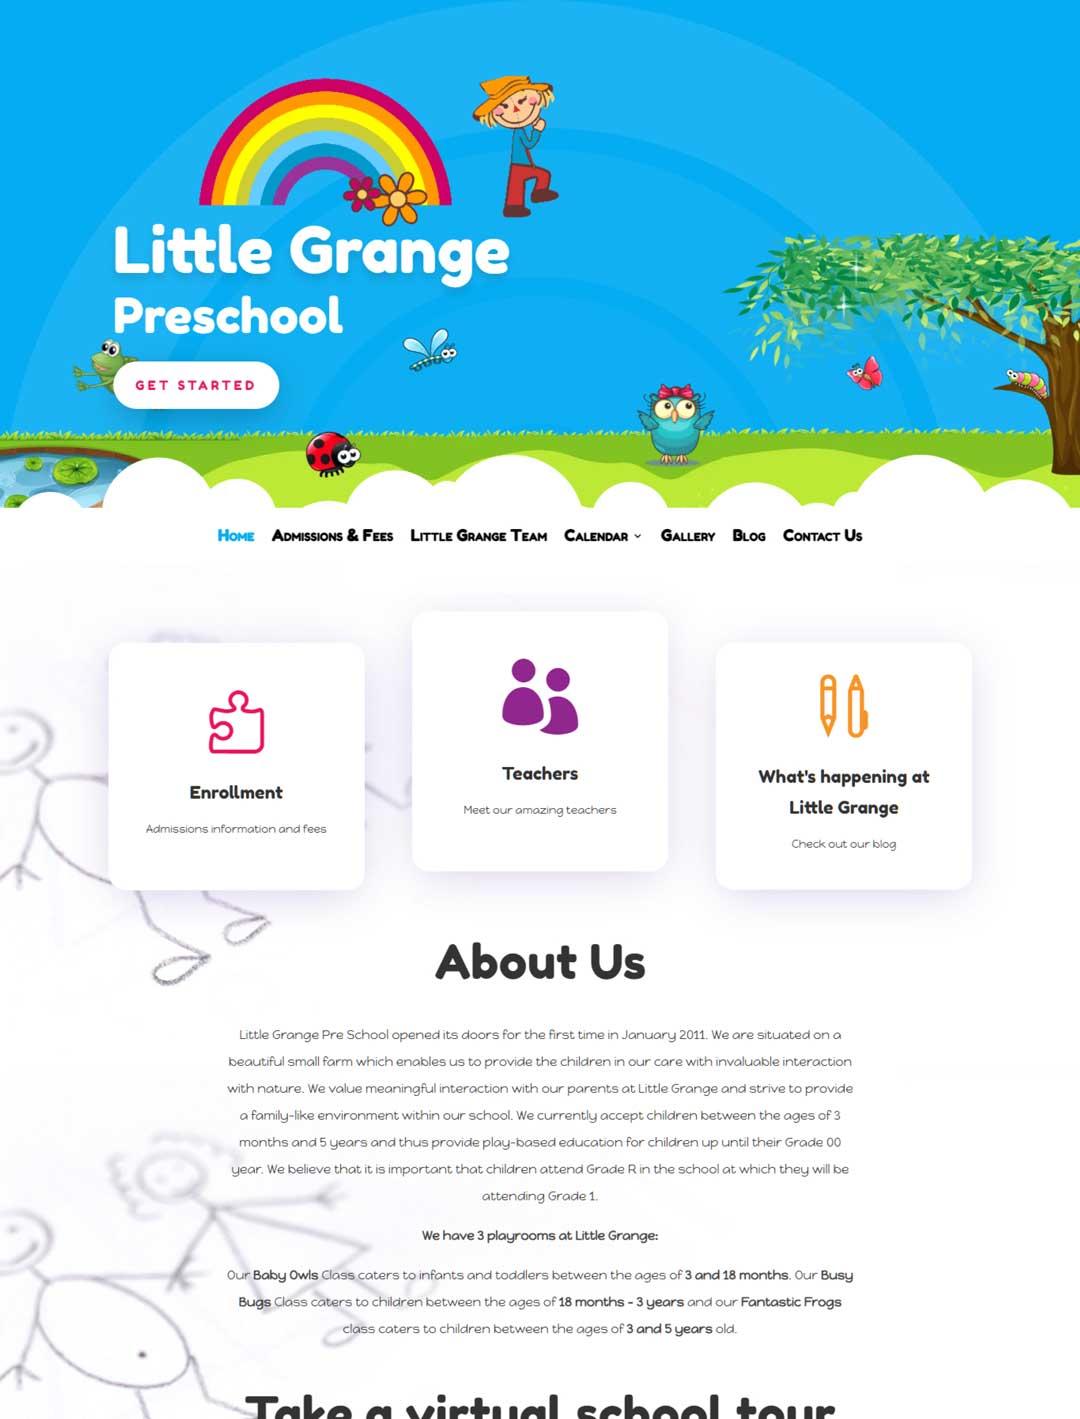 Little Grange site